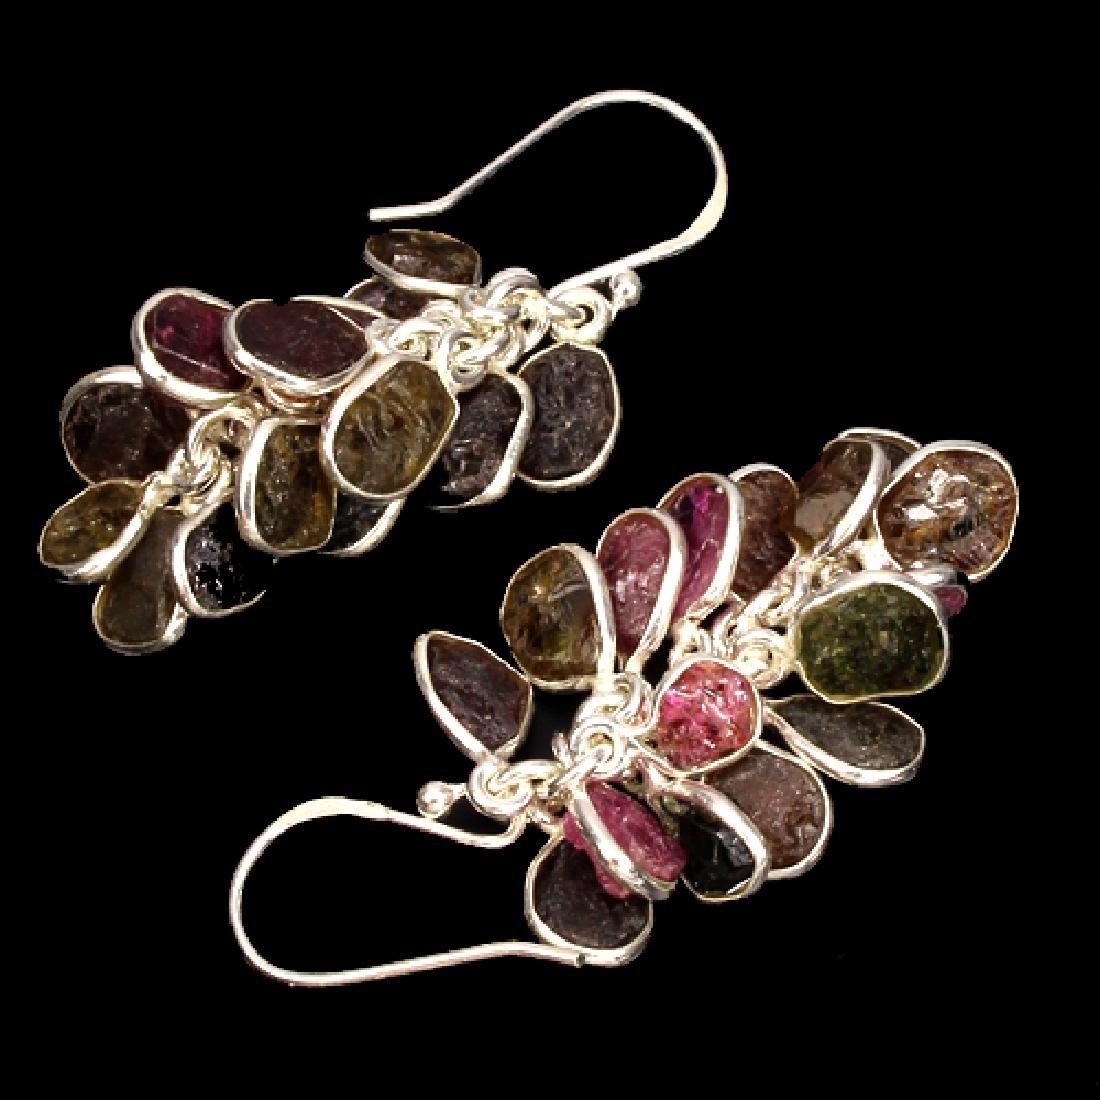 Natural Rough Tourmaline Earrings - 2